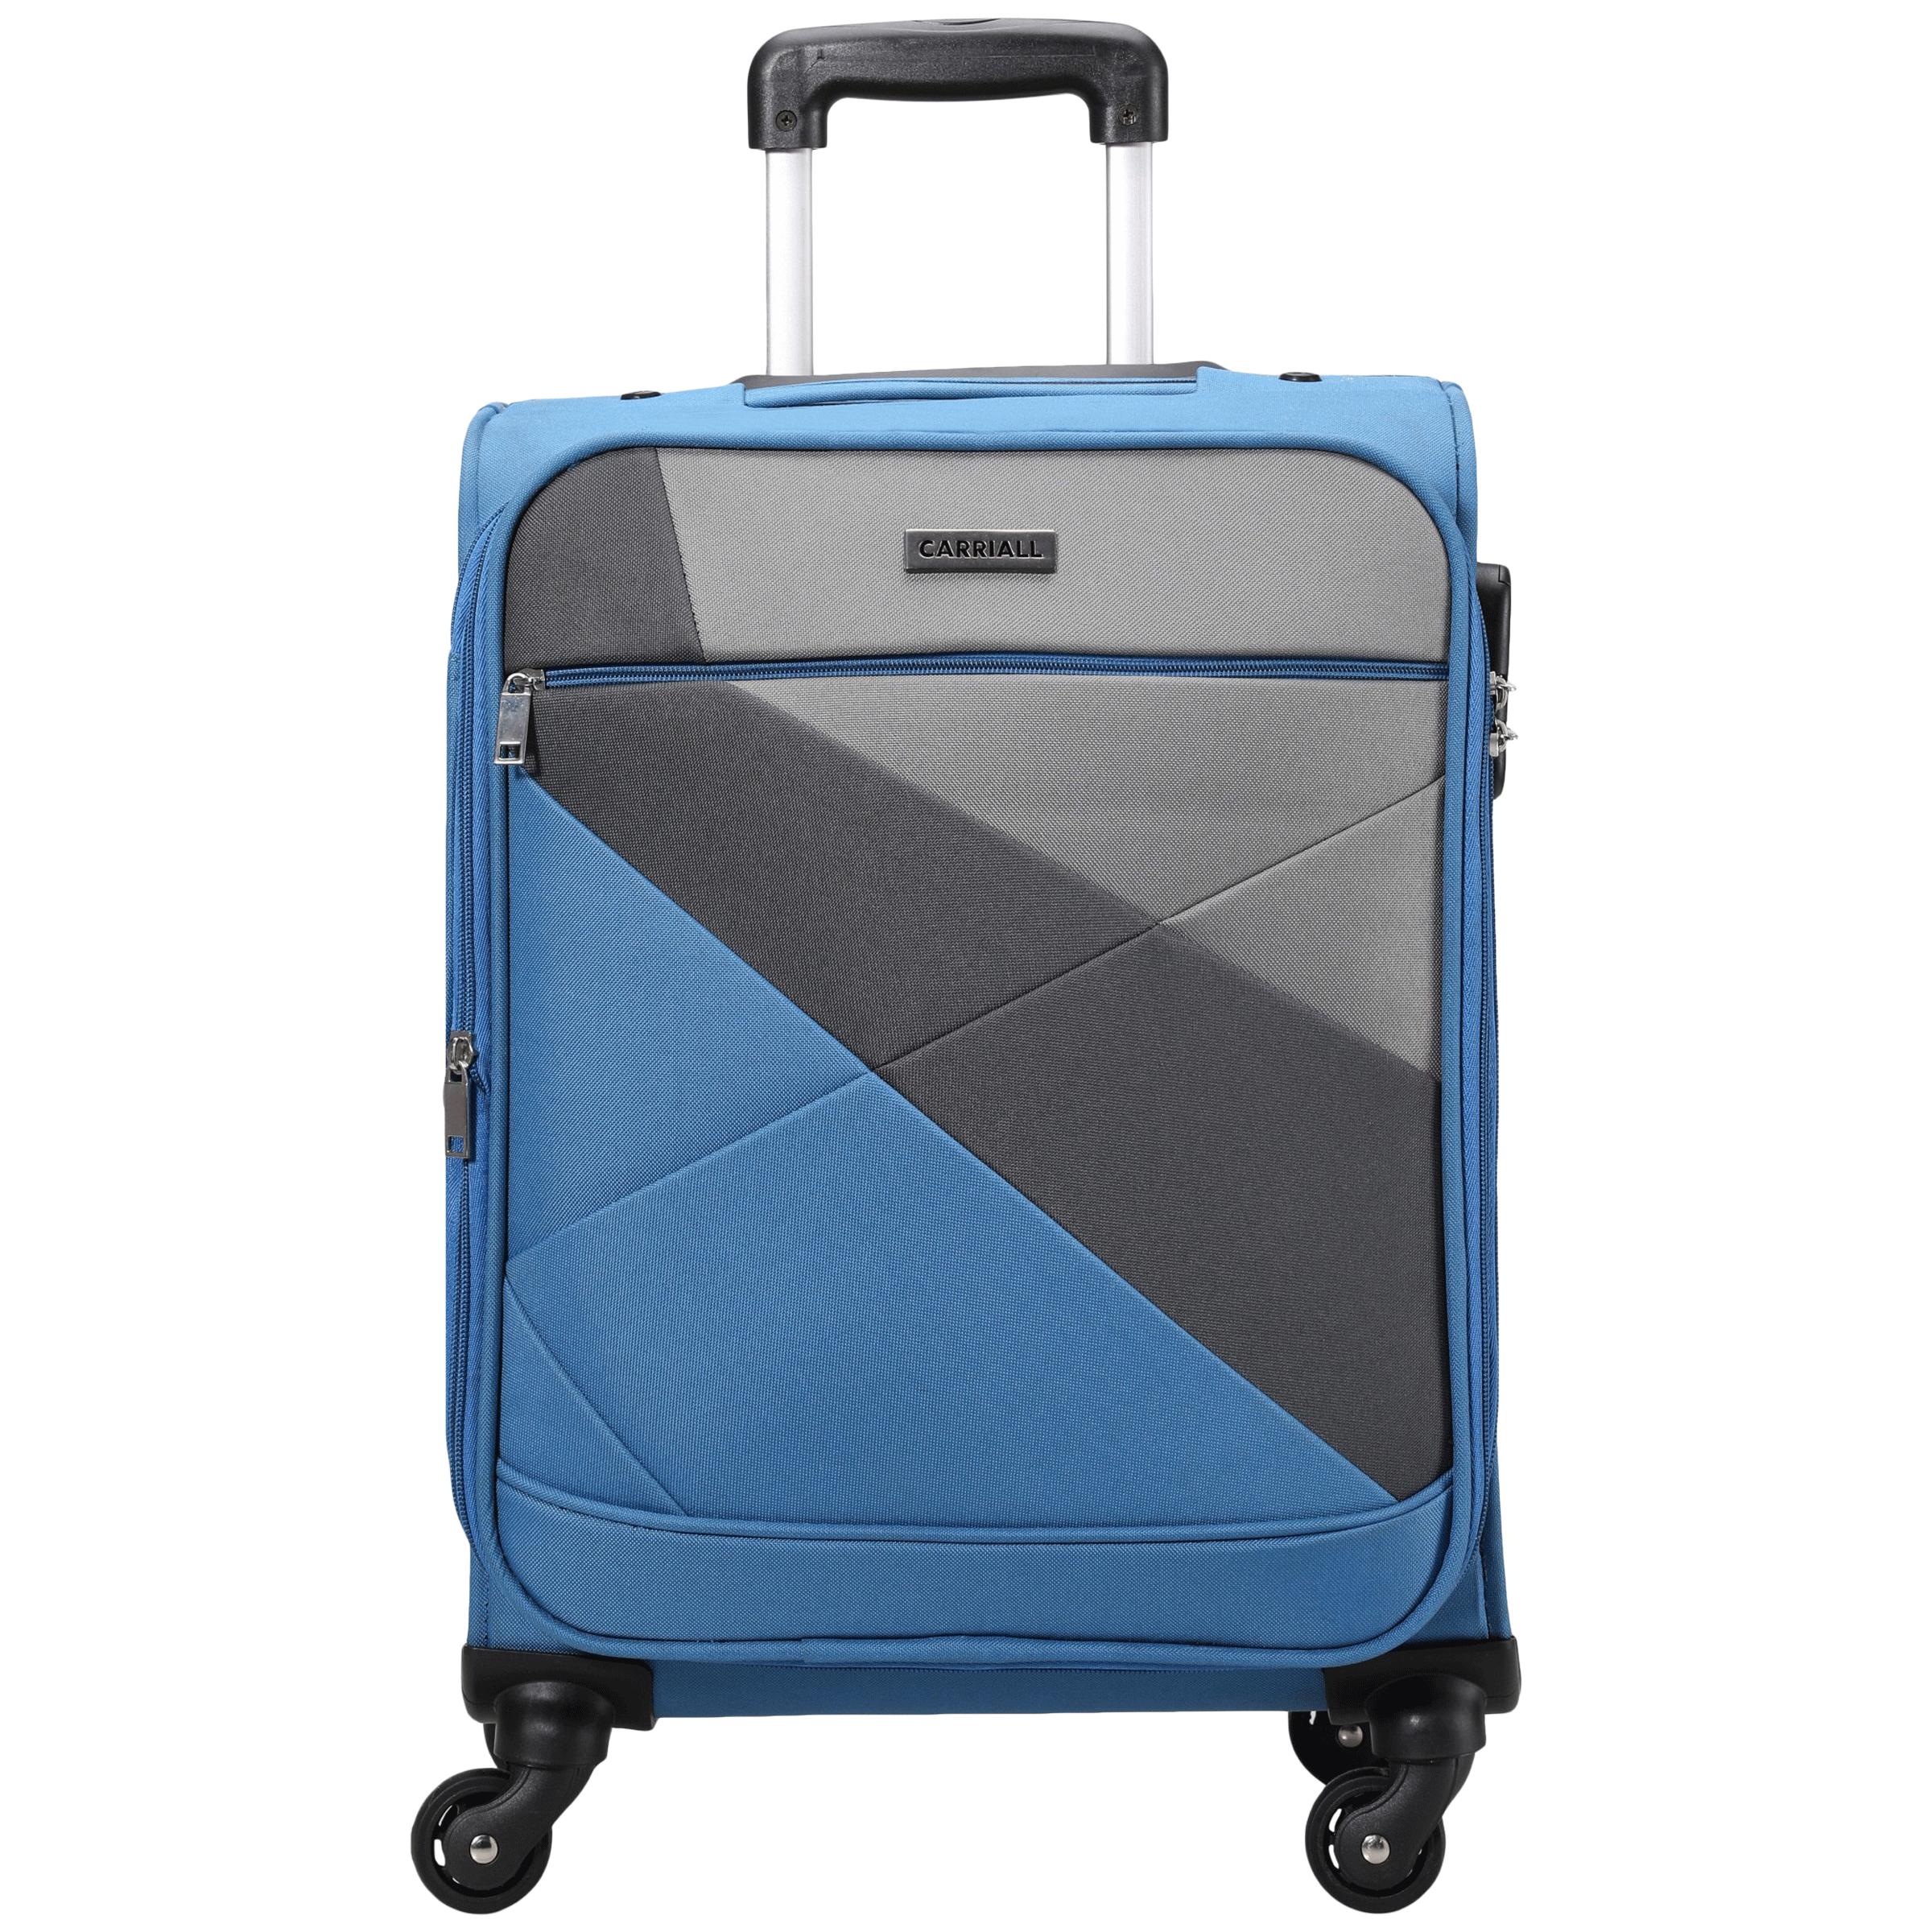 Carriall Vista Trolley Bag (Combination Lock, CASLVS002, Blue)_1